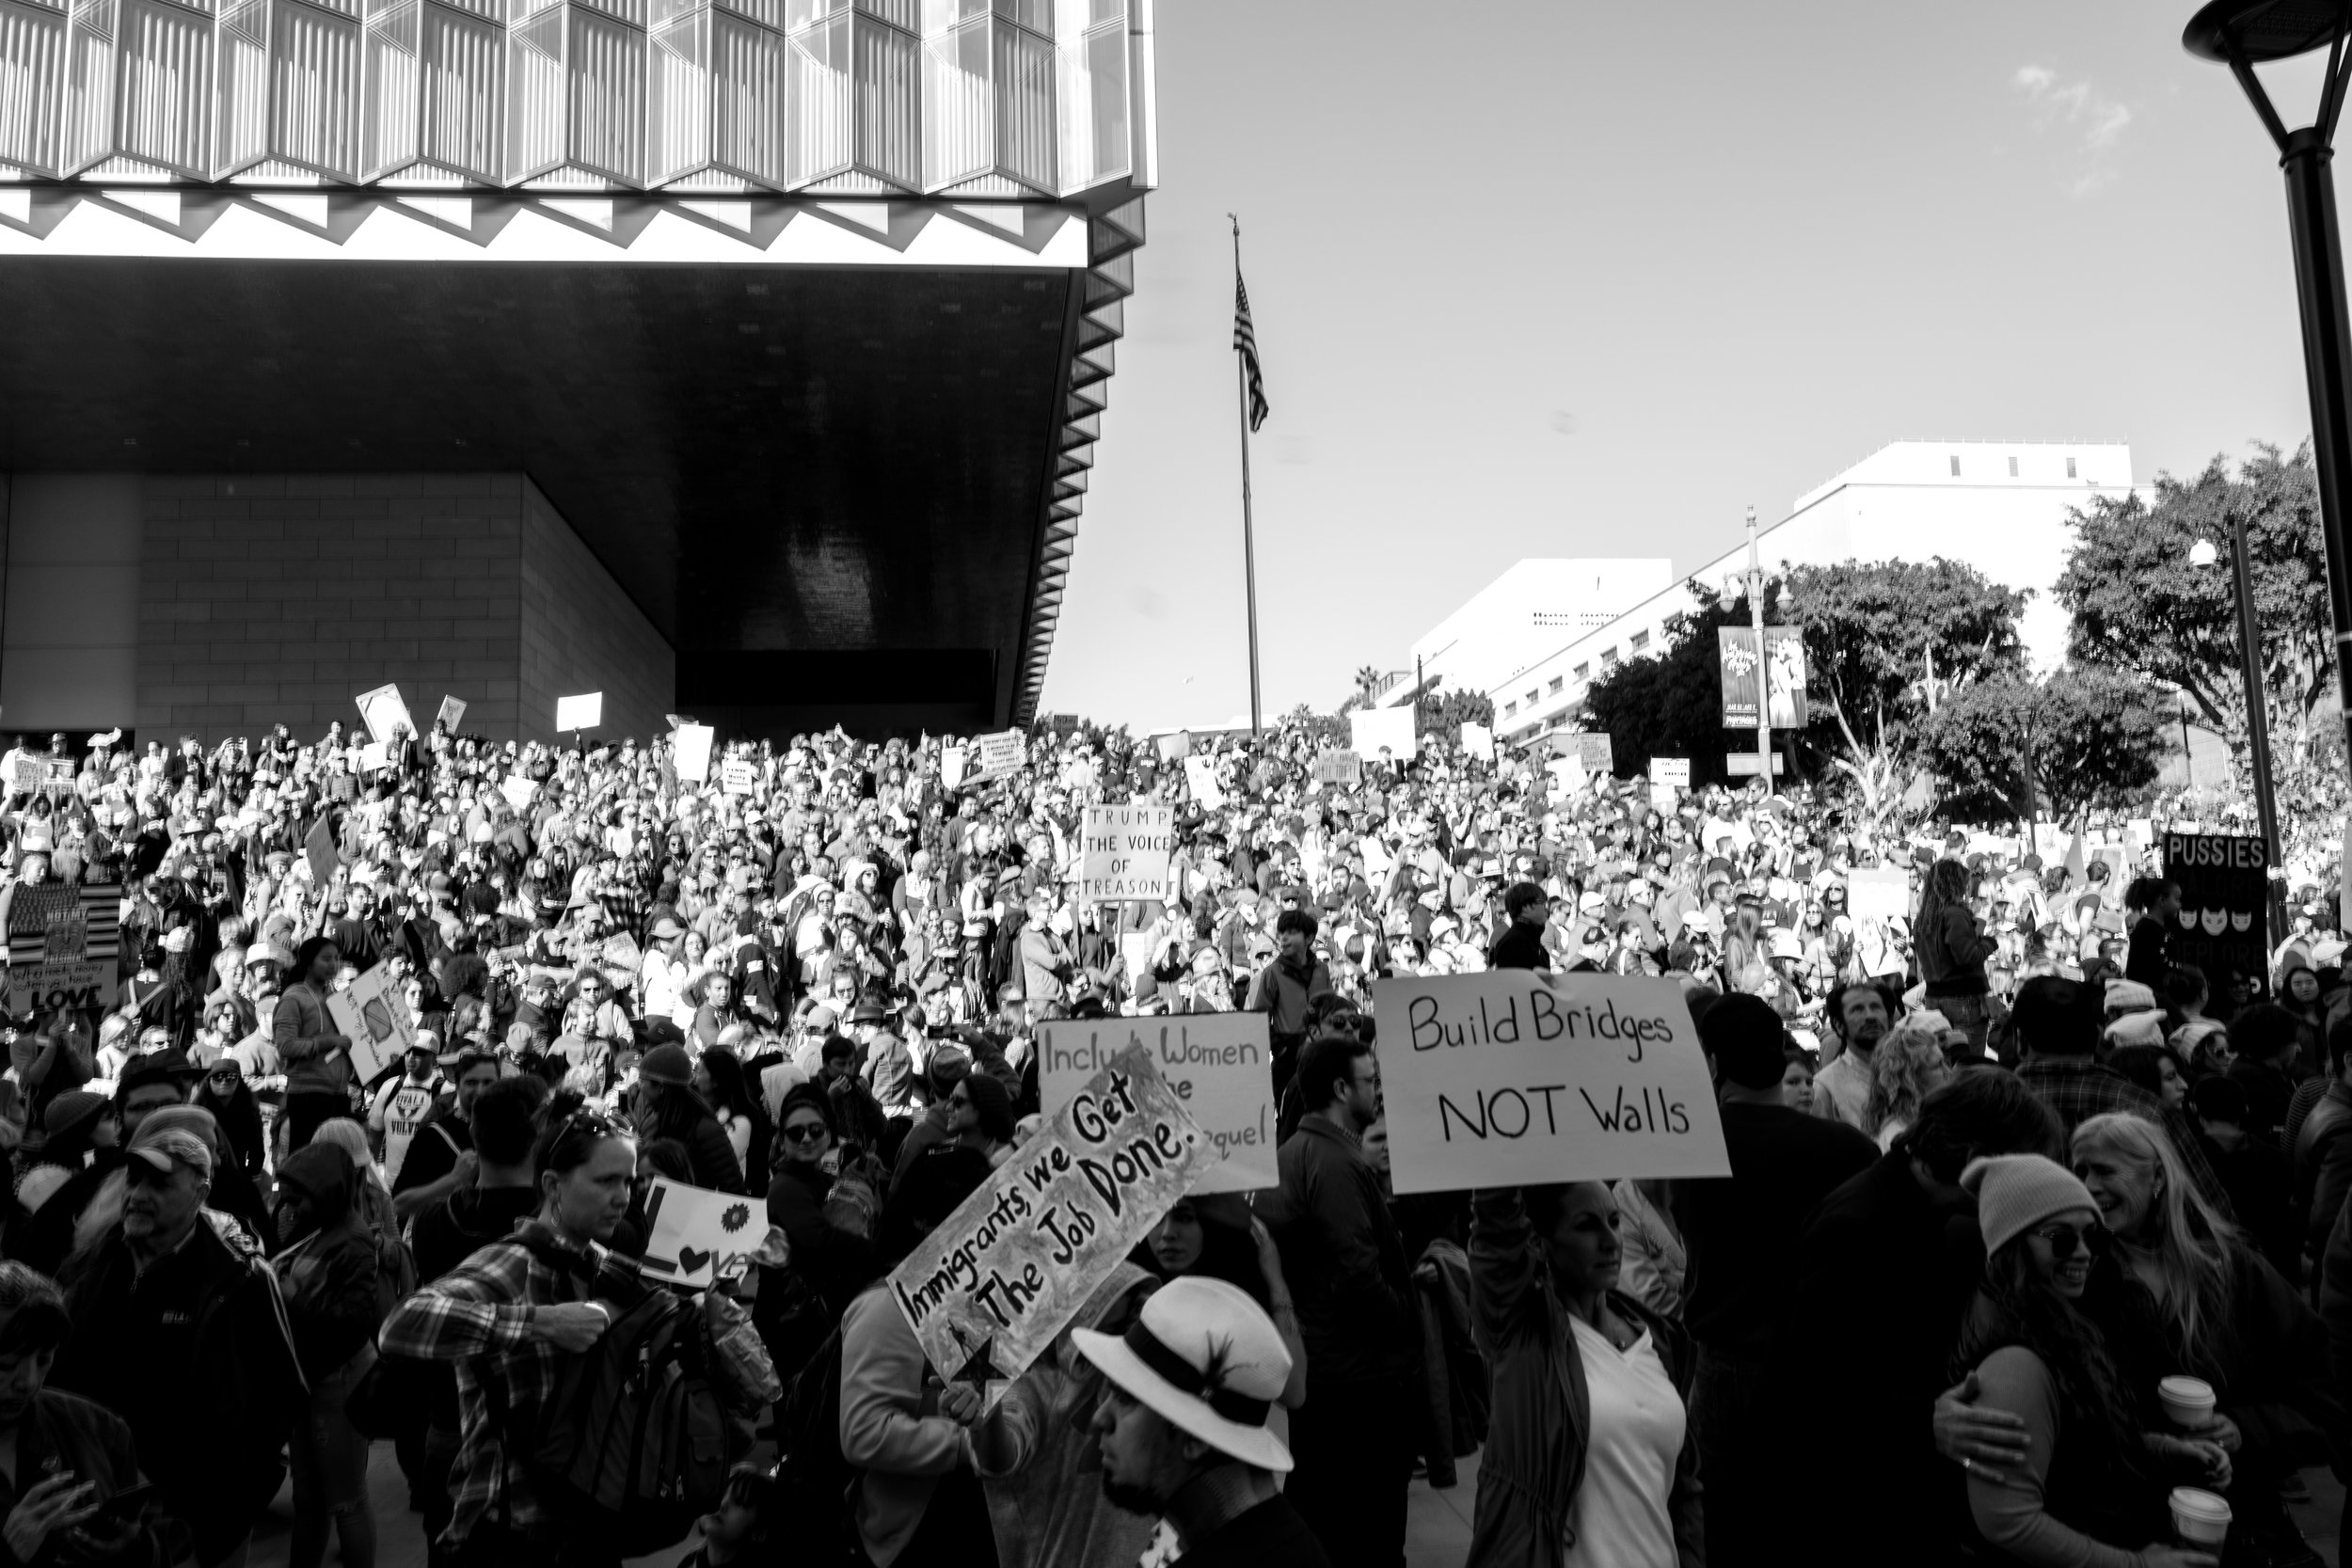 Crowds #2.jpg